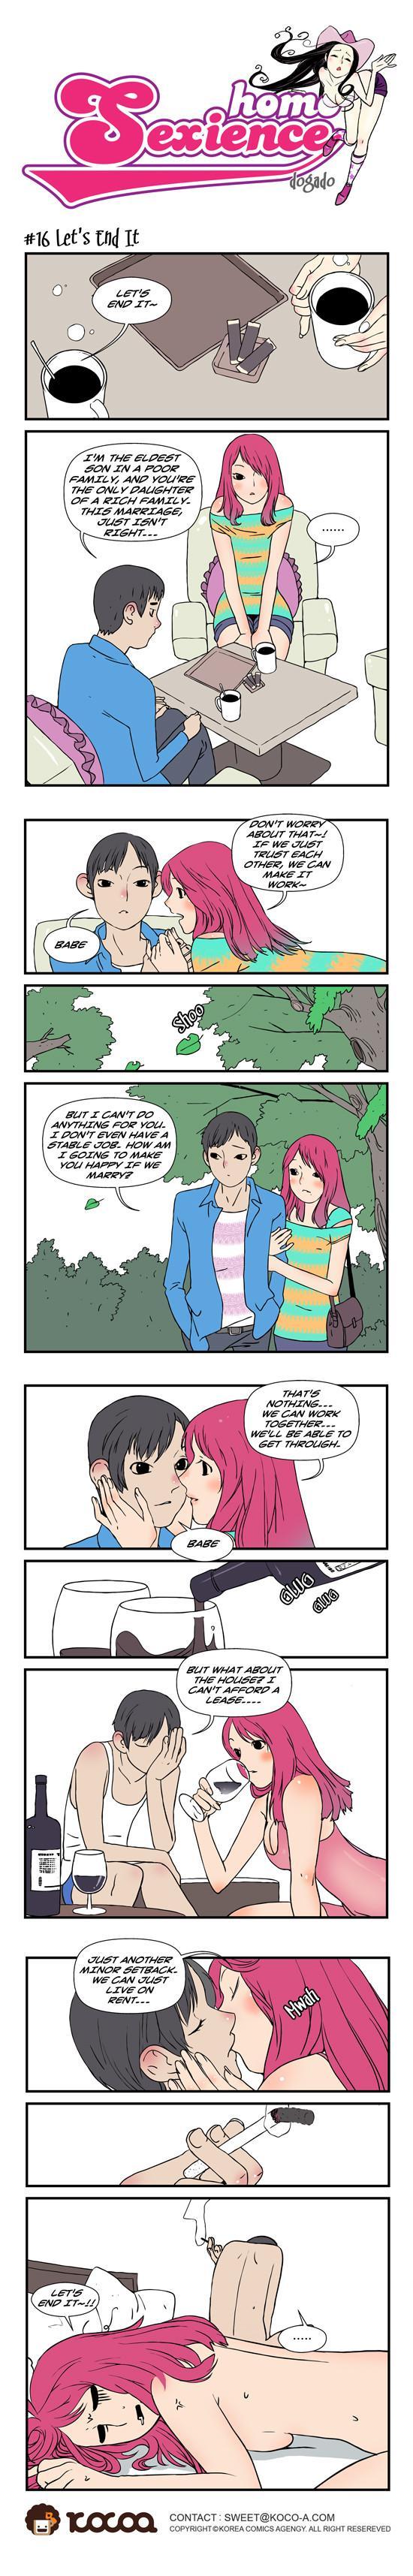 Homo Sexience 15